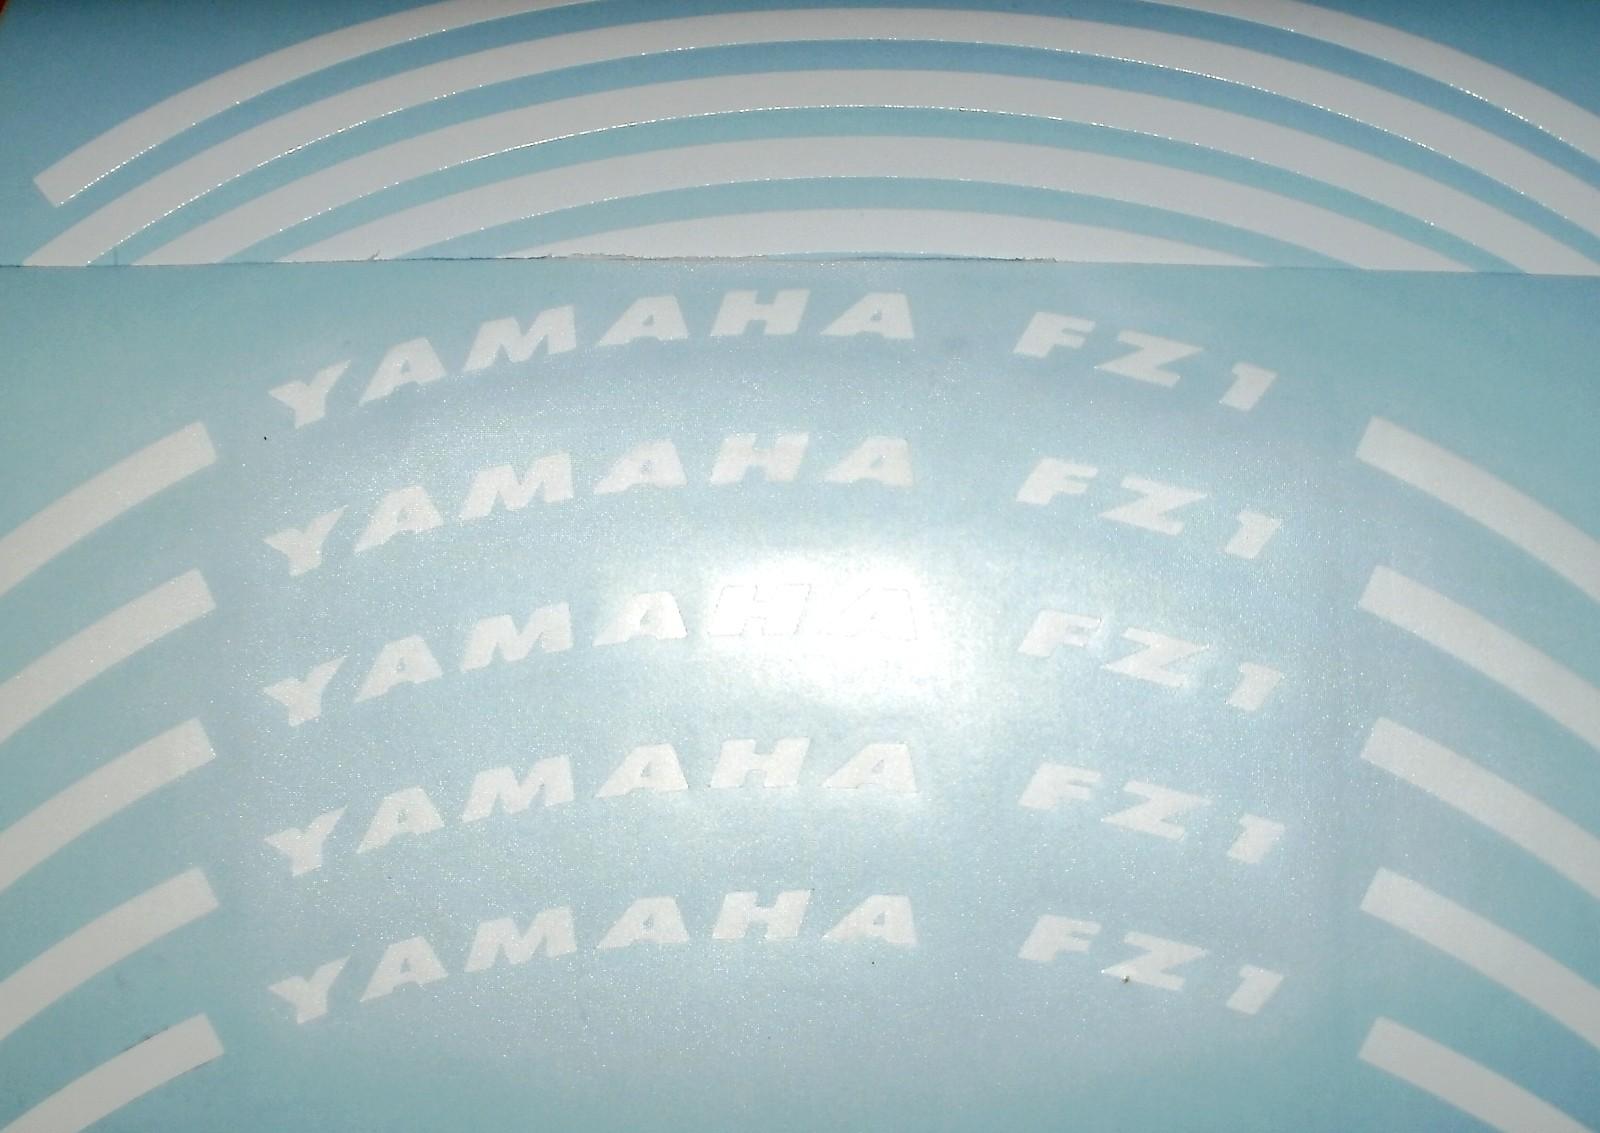 Felgenrandaufkleber Yamaha FZ1 weiß